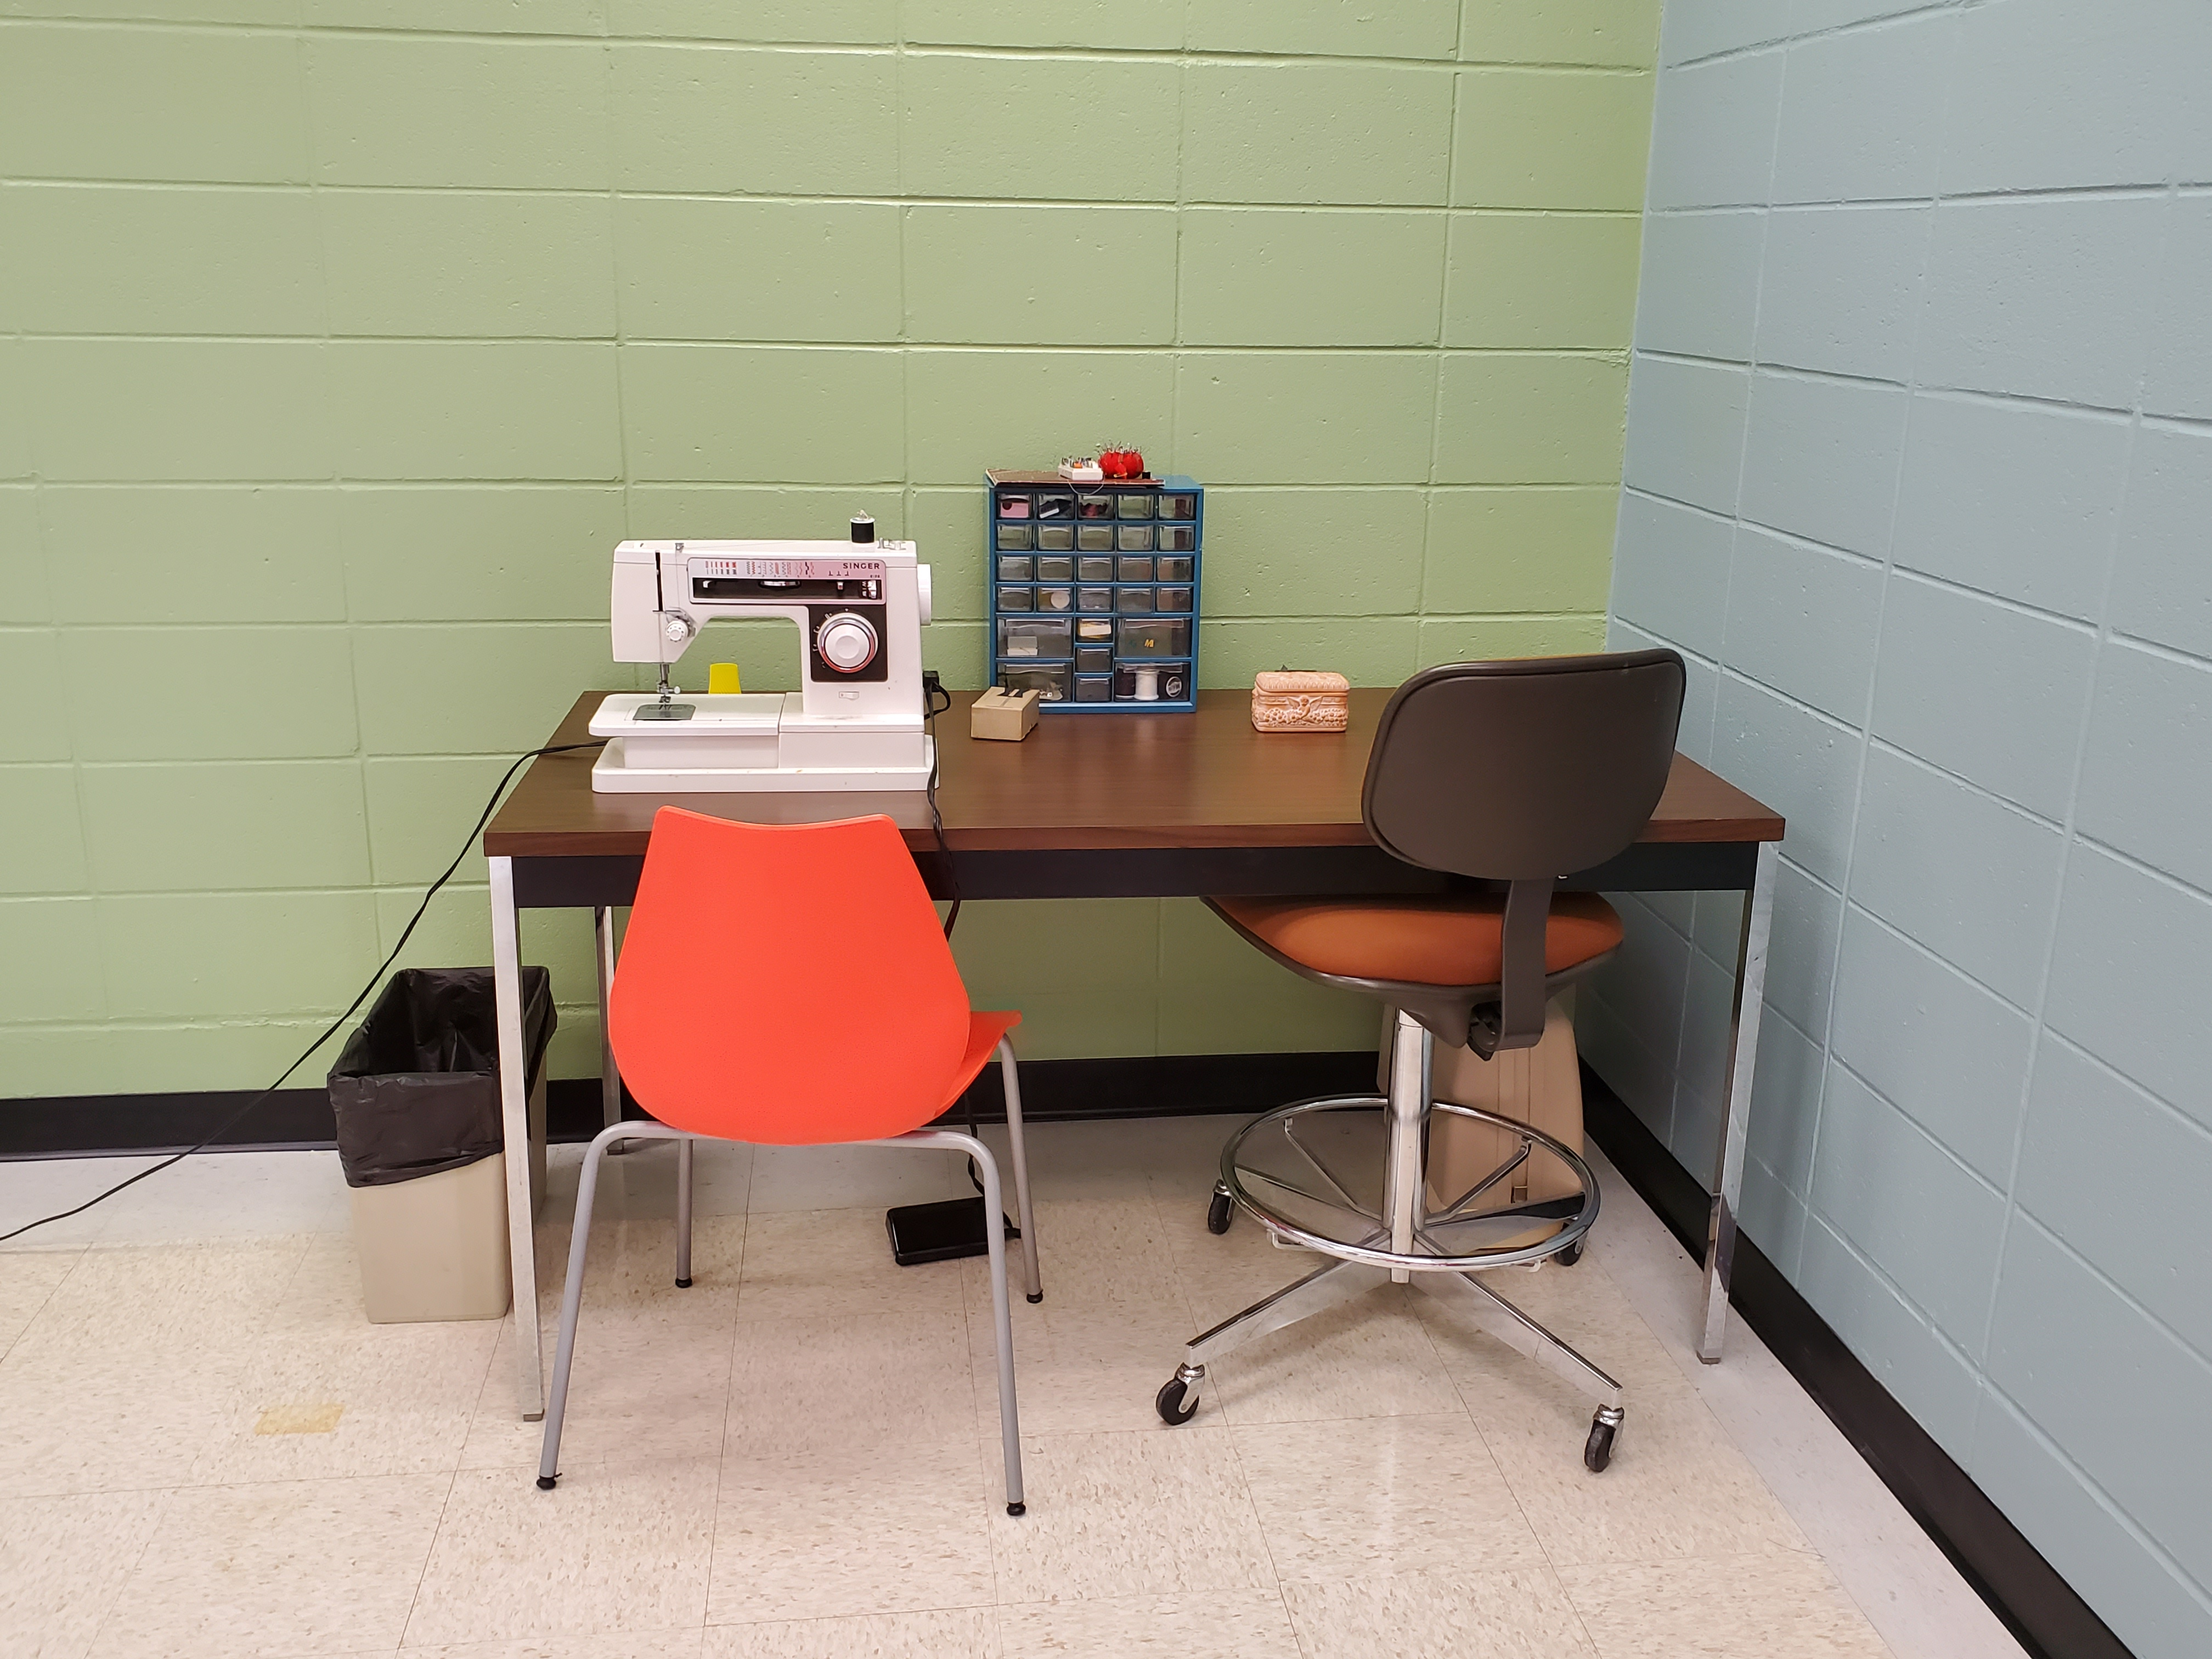 Image of sewing studio